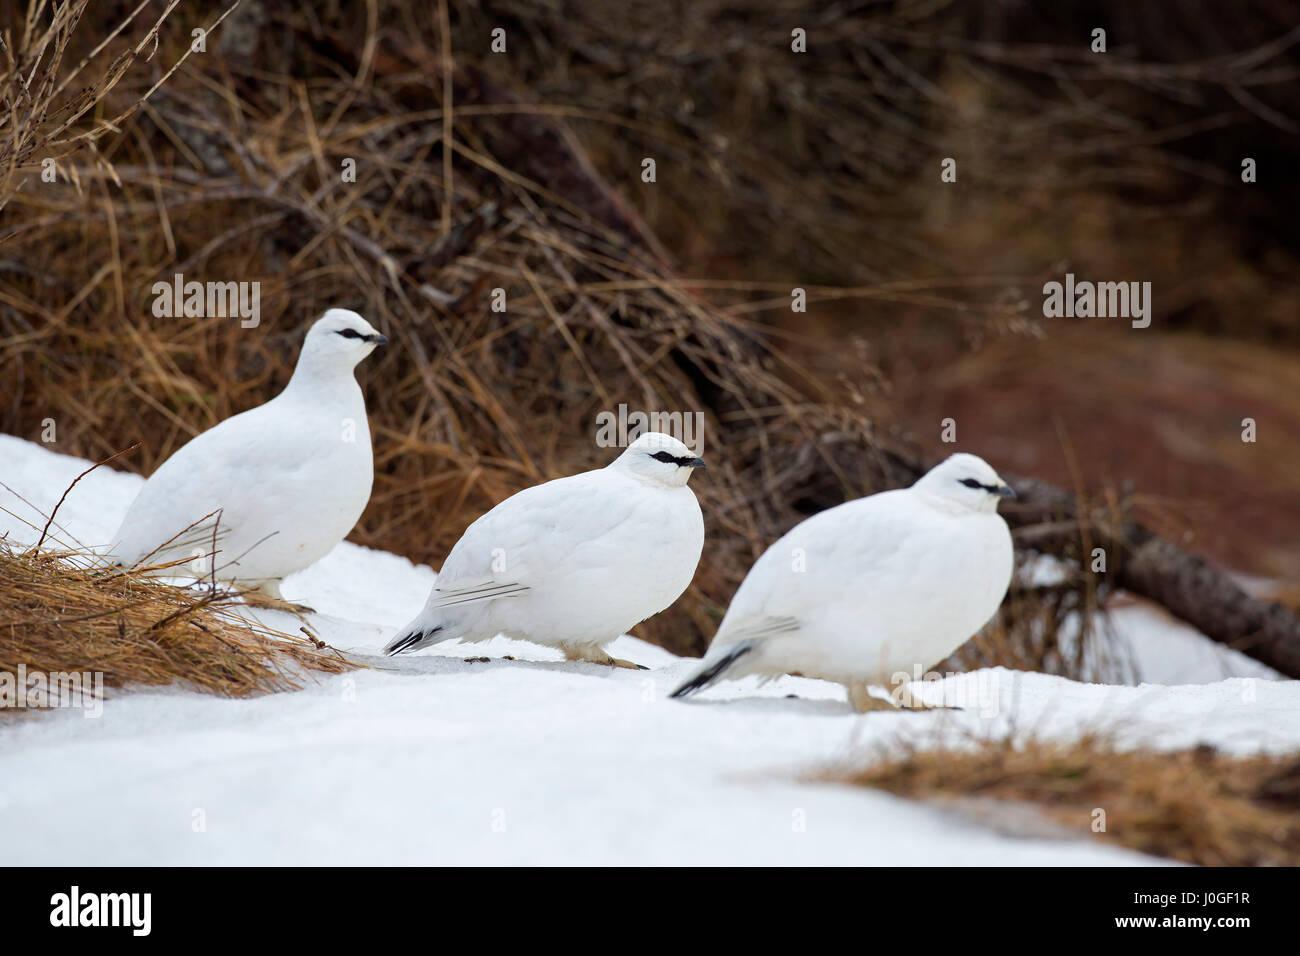 Three rock ptarmigans (Lagopus muta / Lagopus mutus) in winter plumage - Stock Image